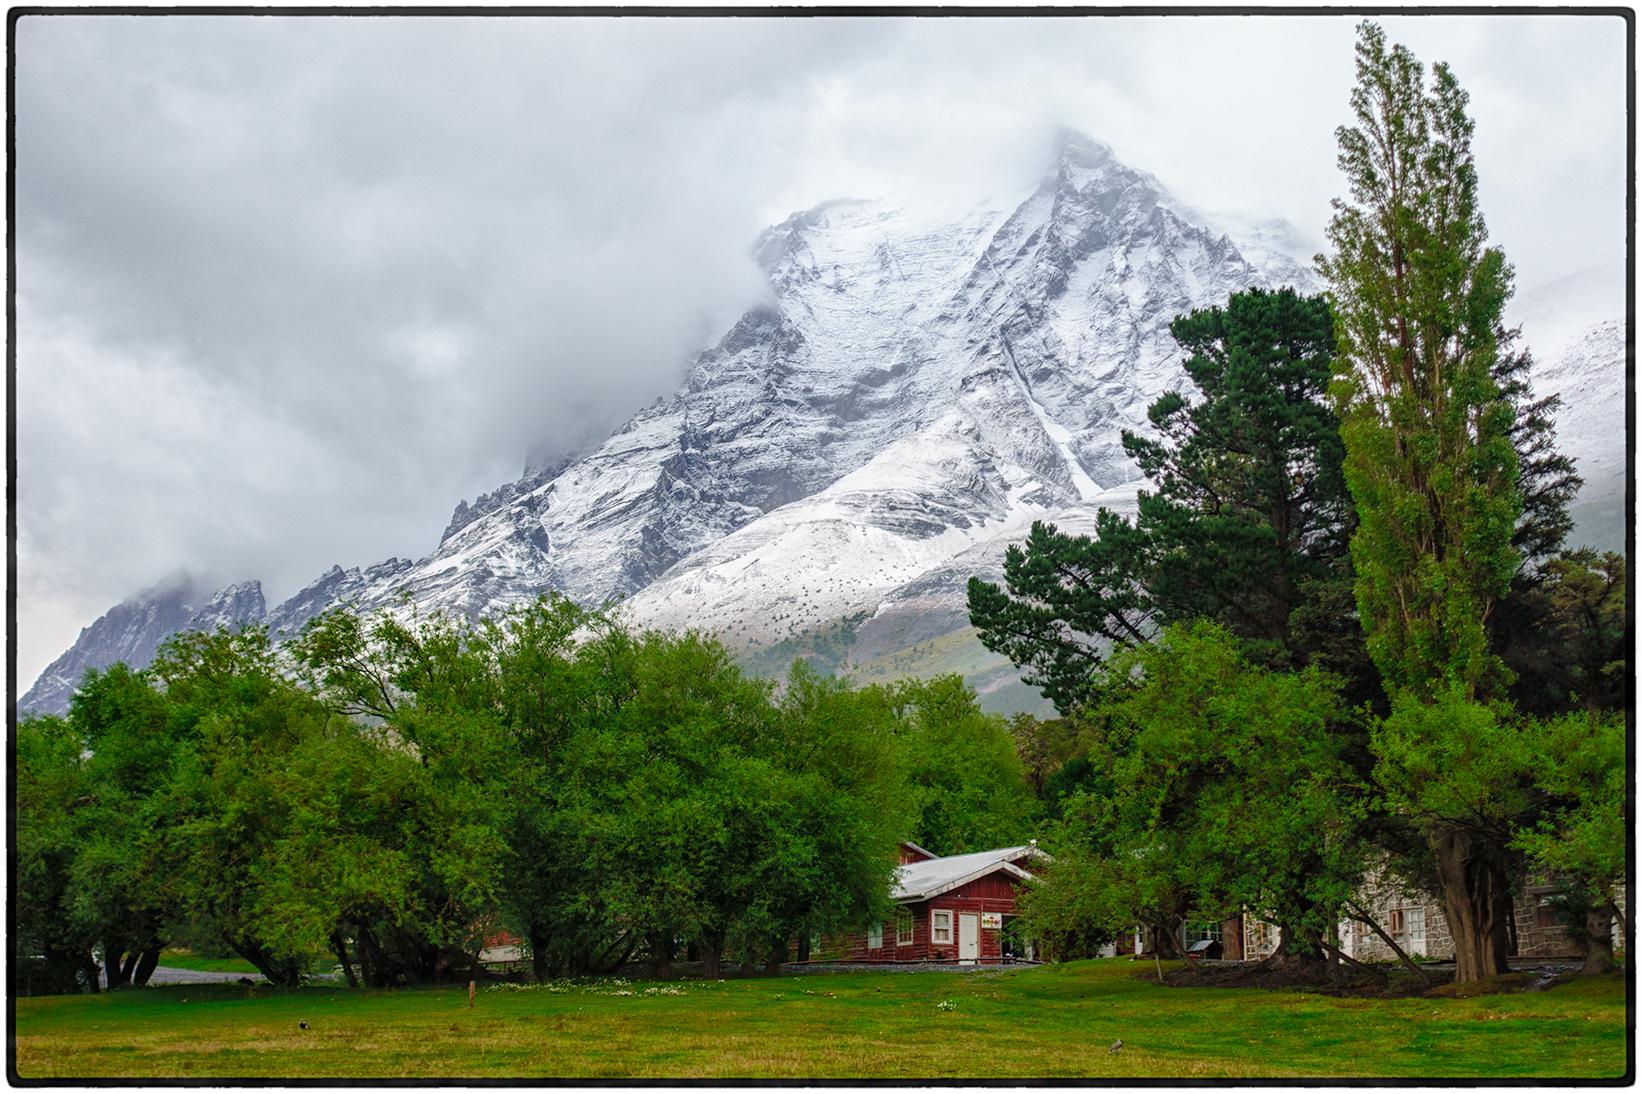 Hotel Site, Torres del Paine, Chile